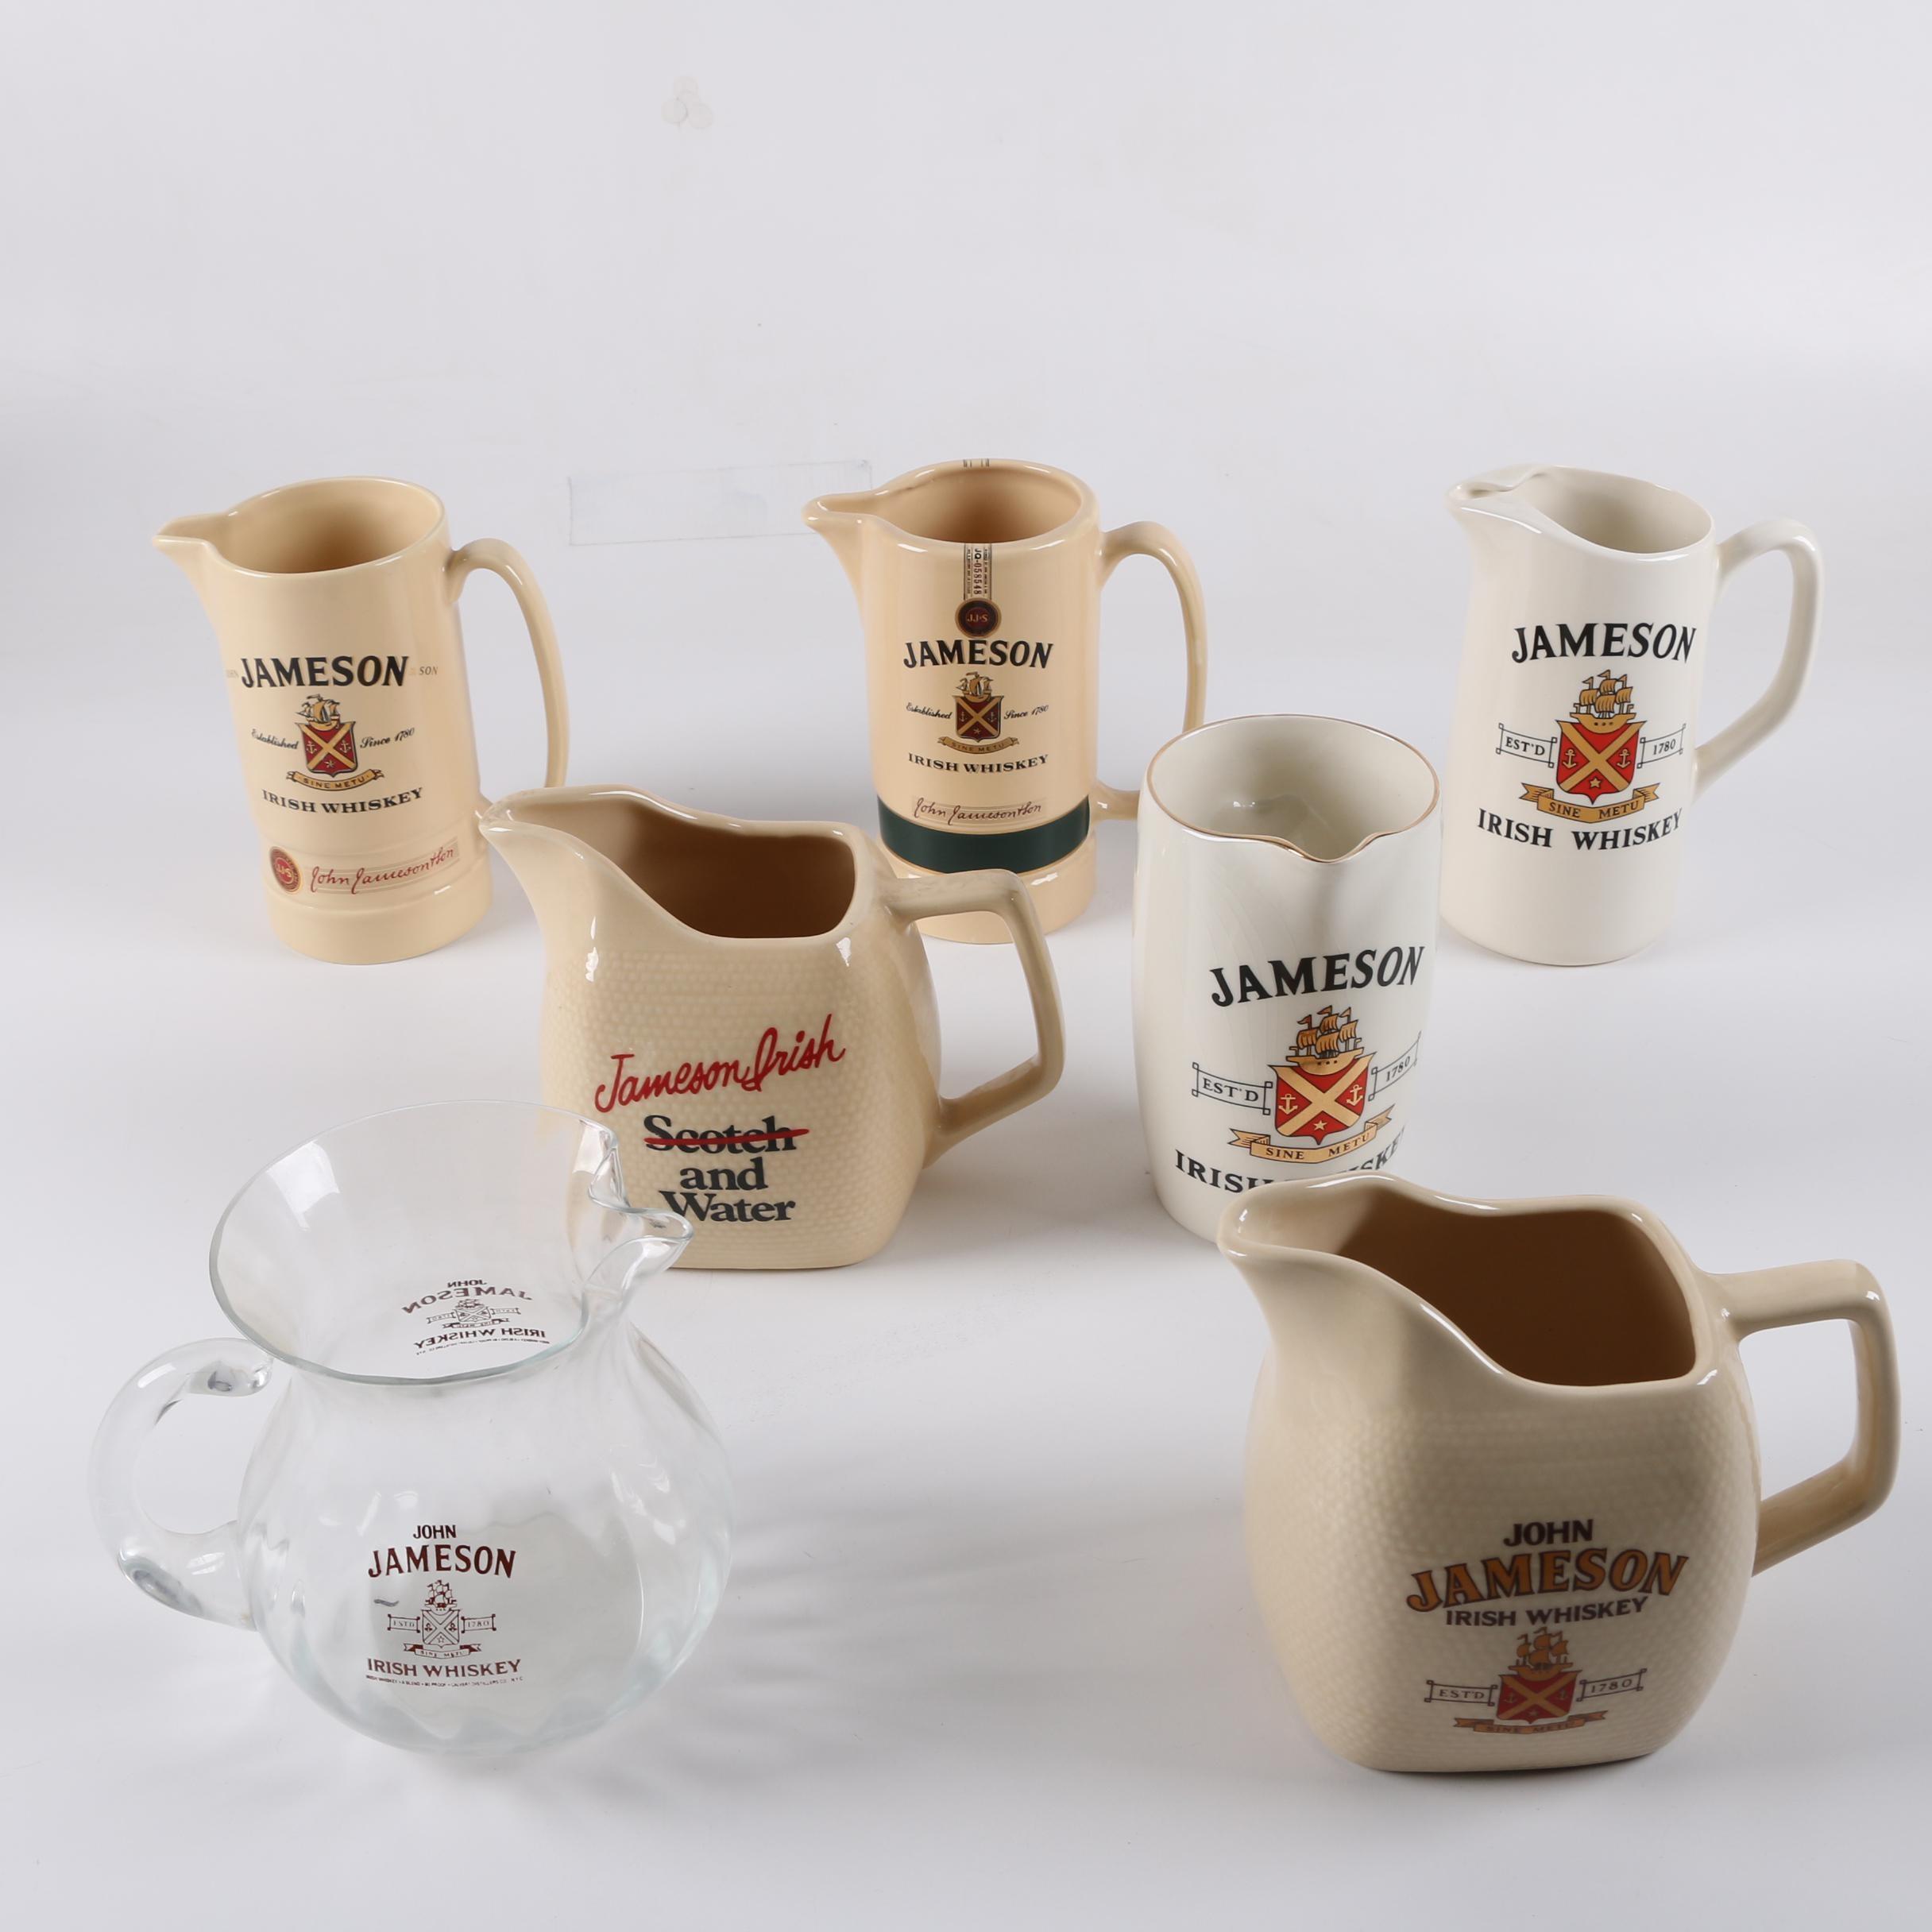 Vintage Pitchers Advertising Whiskey